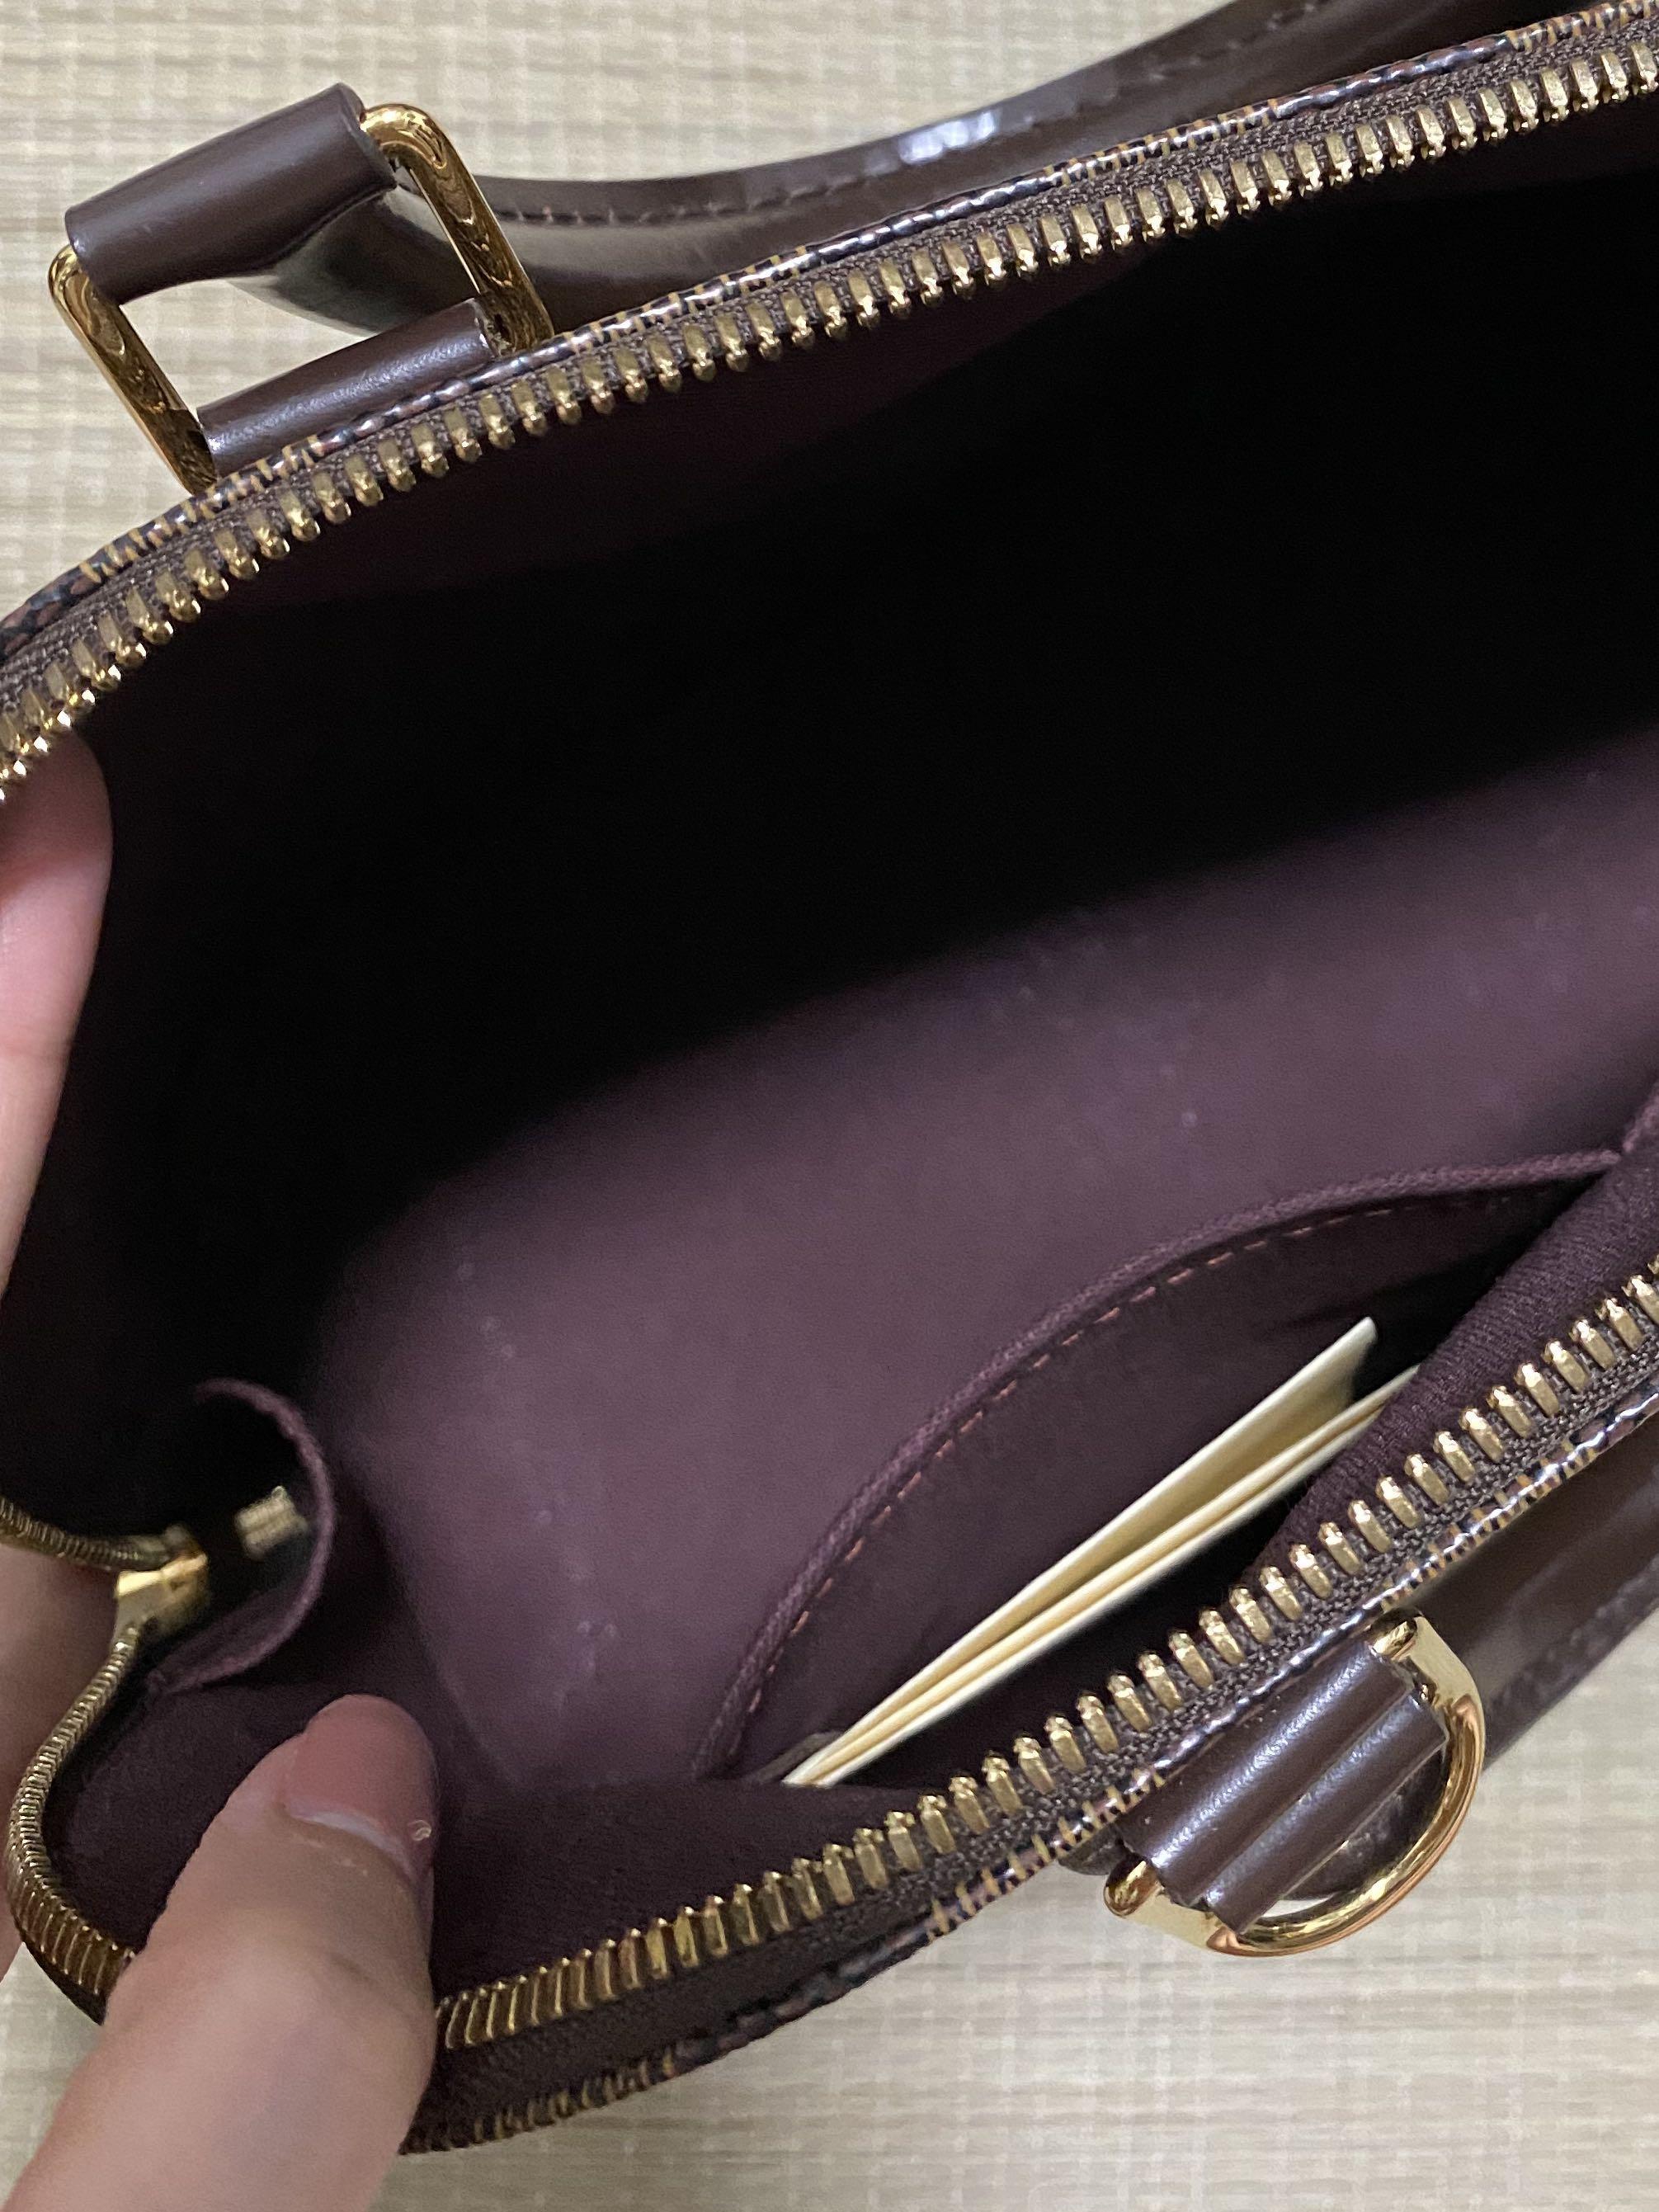 Louis Vuitton Alma PM (tags: bags, LV, Damier, Ebene, brandedbag, branded, LVbags, bag, luxury, gift)